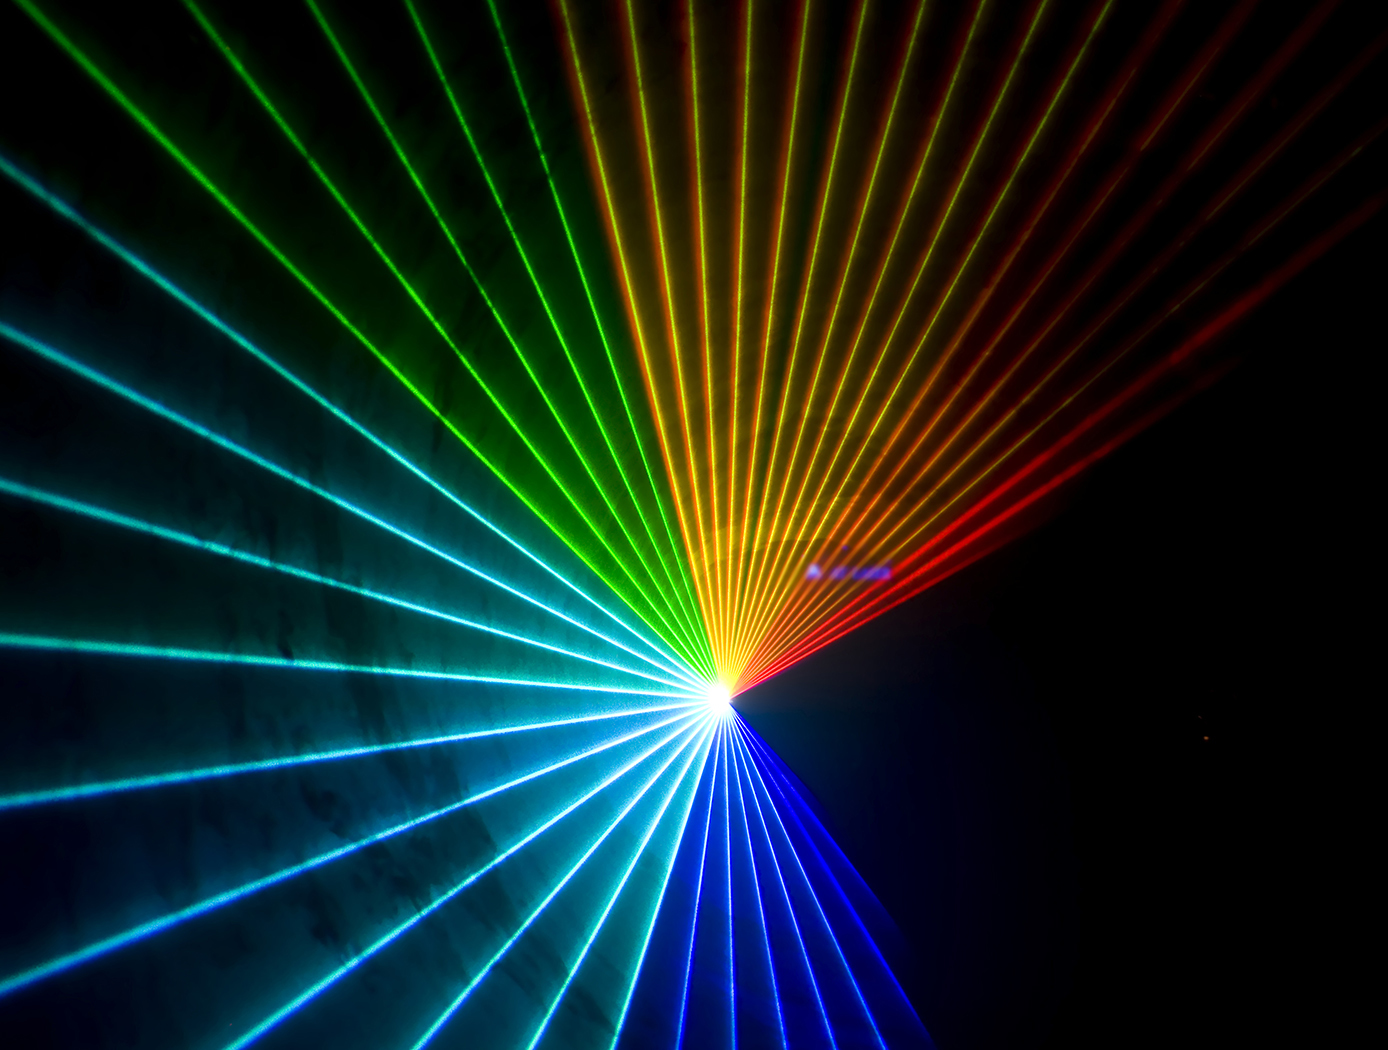 Multi-colored Lasers